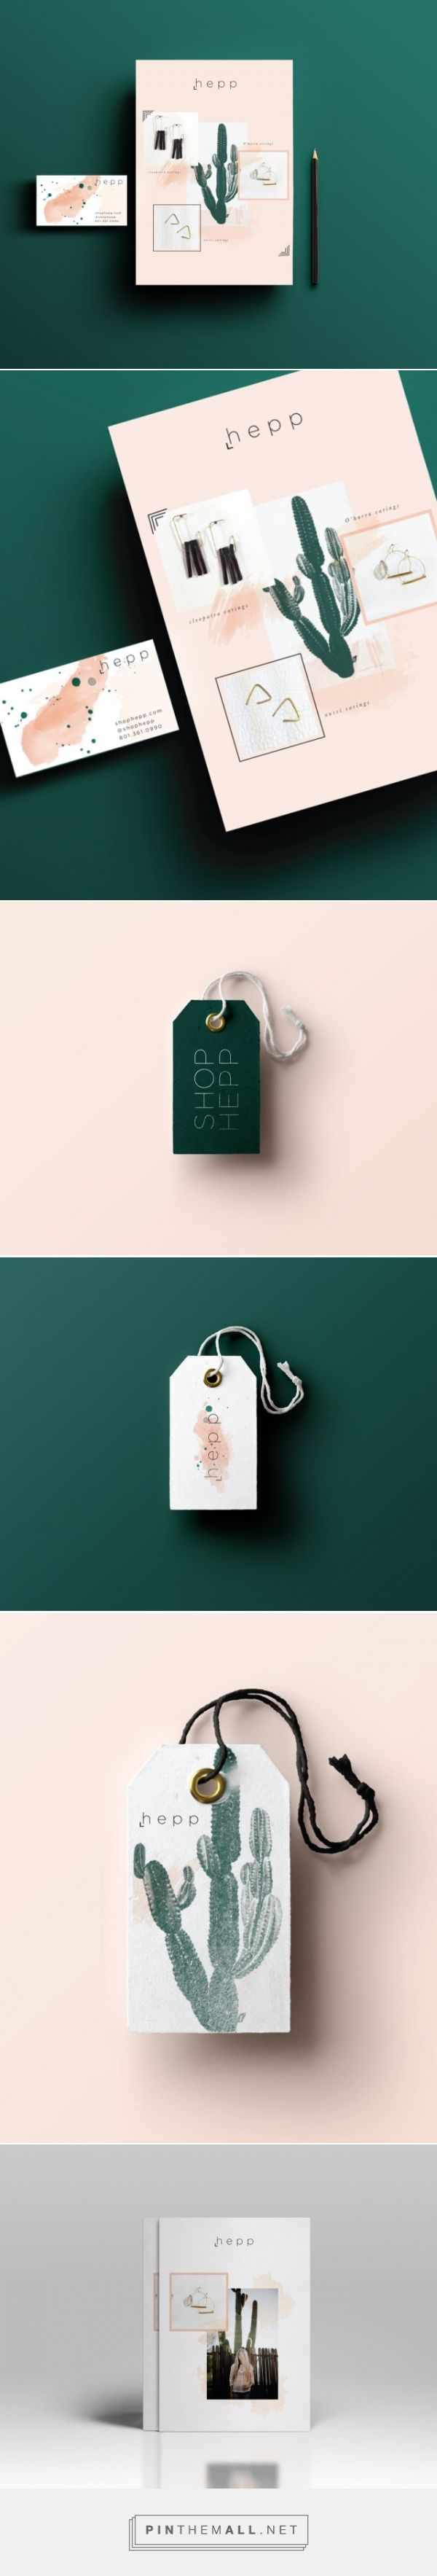 Hepp Branding by West End Girl Studio   Fivestar Branding – Design and Branding Agency & Inspiration Gallery